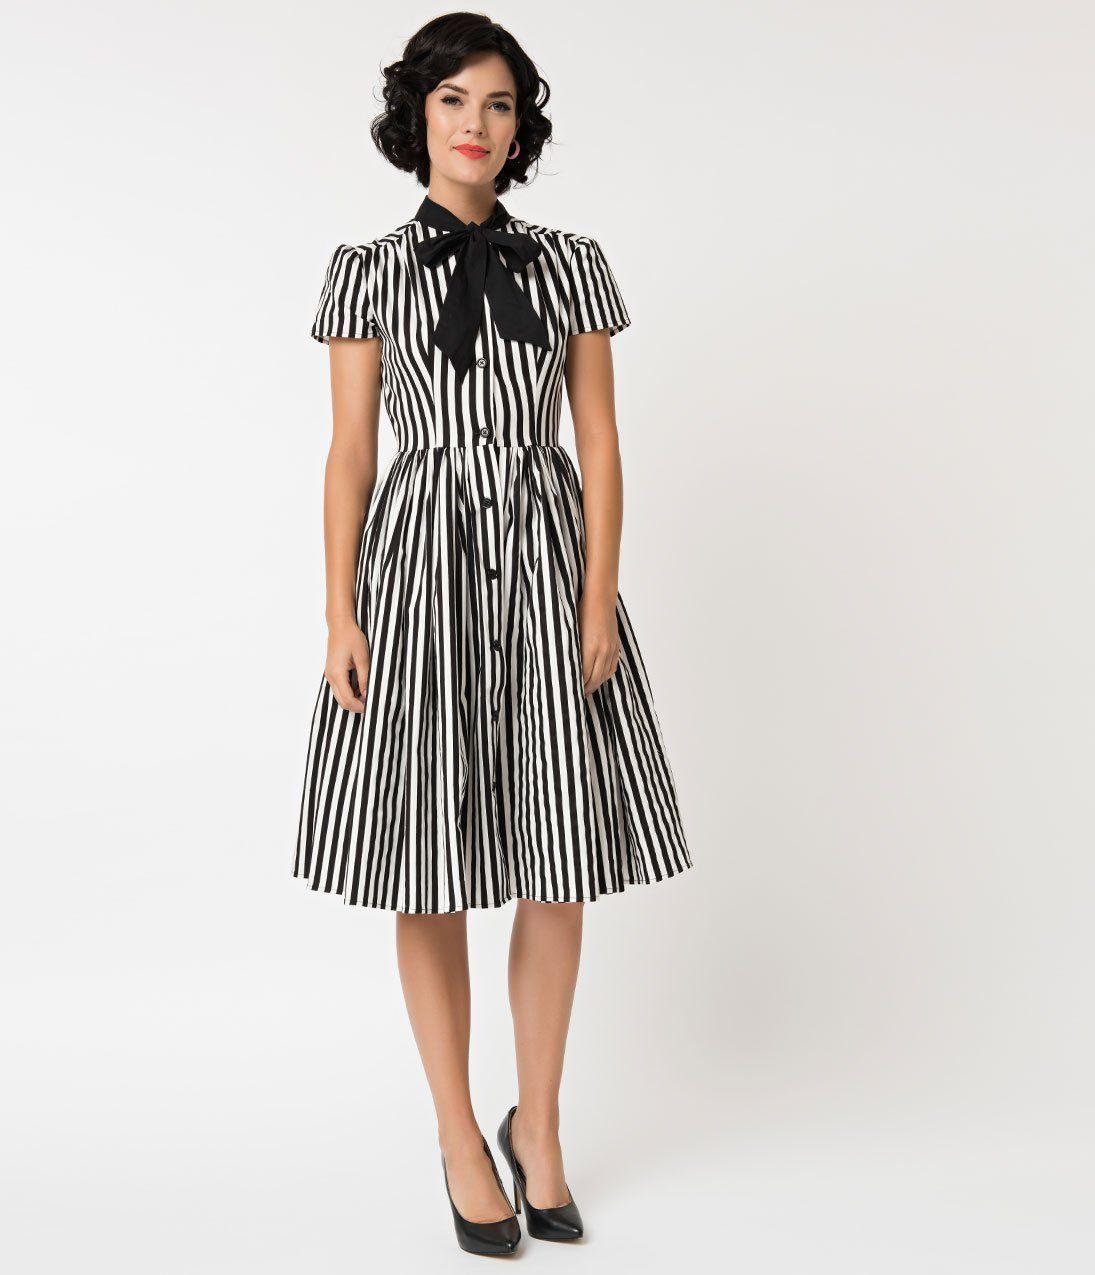 100db99da27a Unique Vintage 1950s Style Black   White Striped Button Up Swing Dress